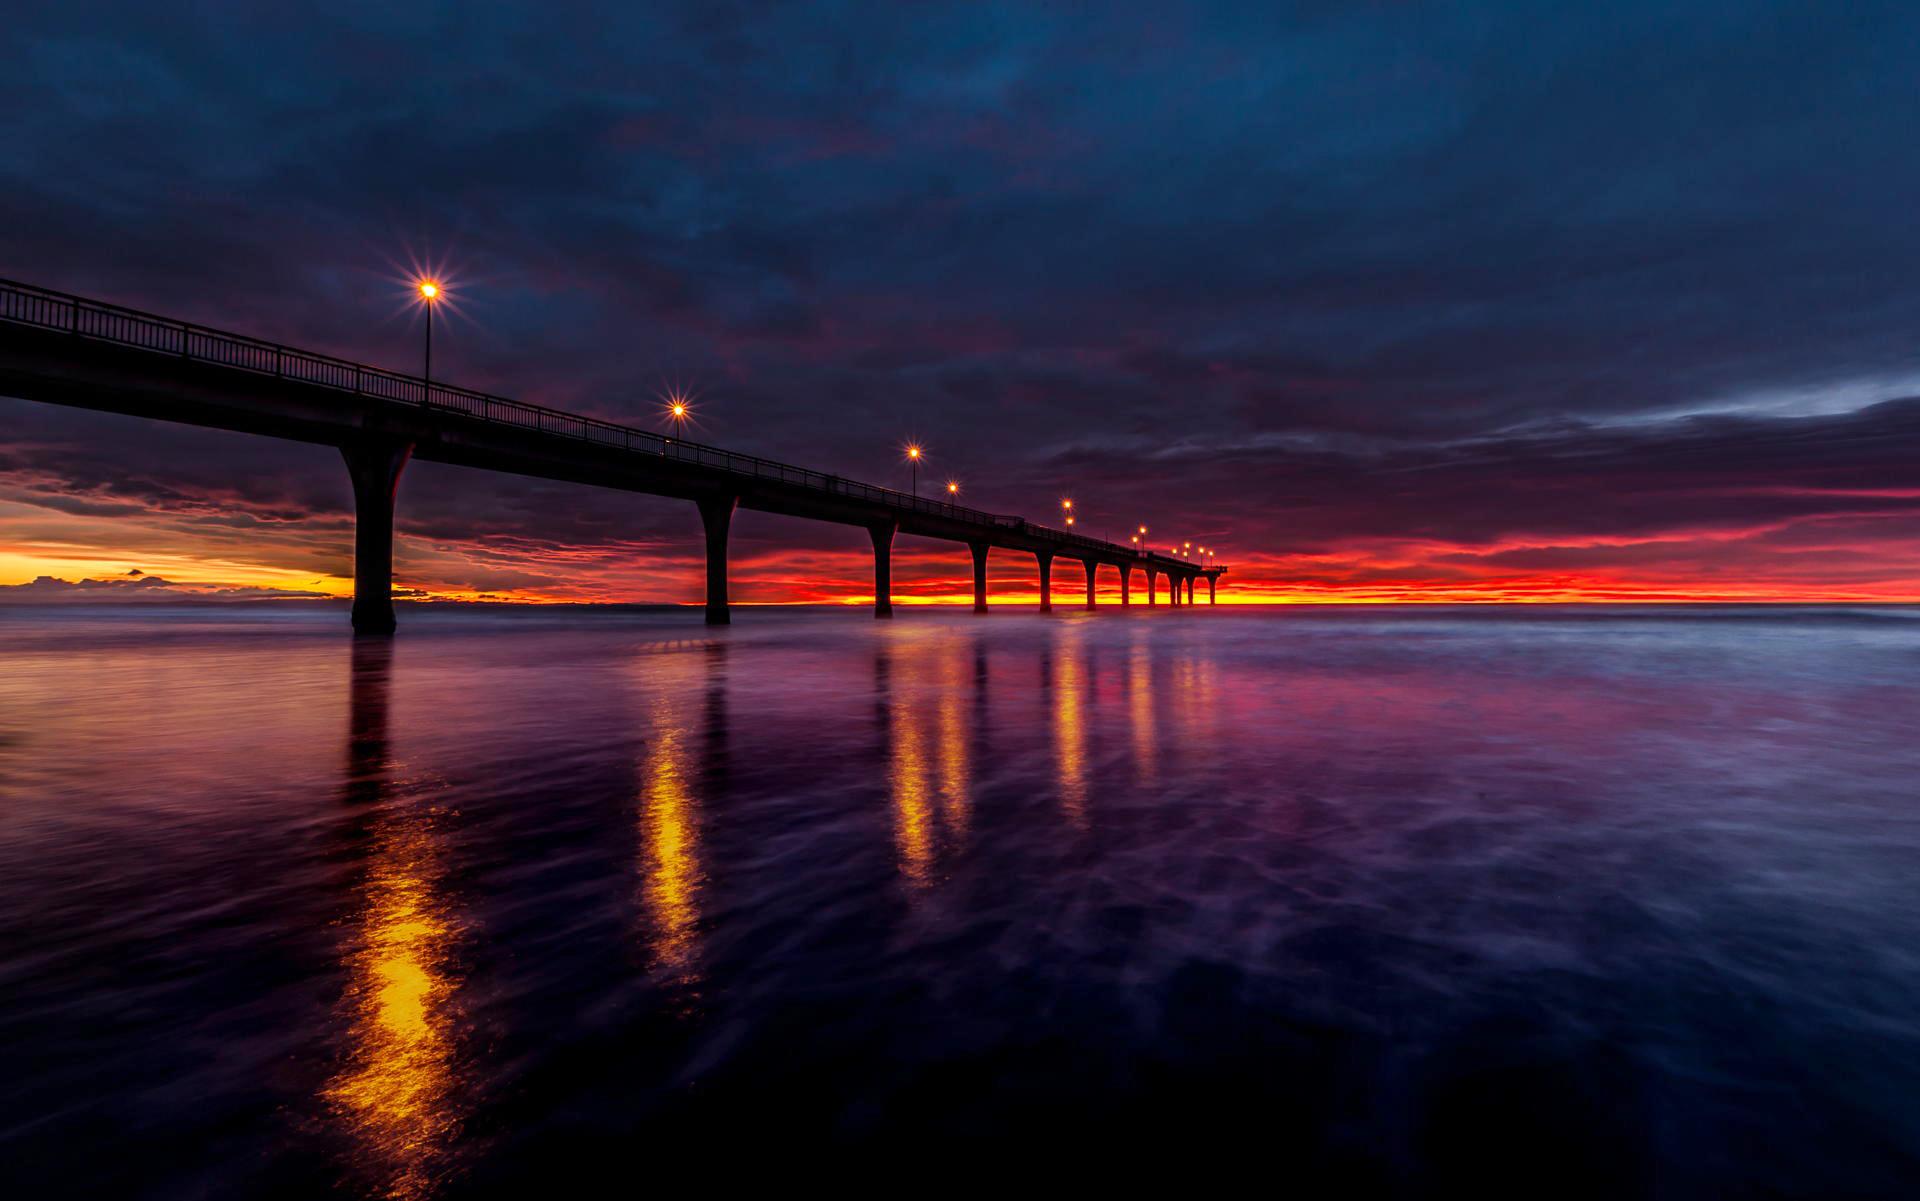 мост фонари море небо  № 3388141 загрузить